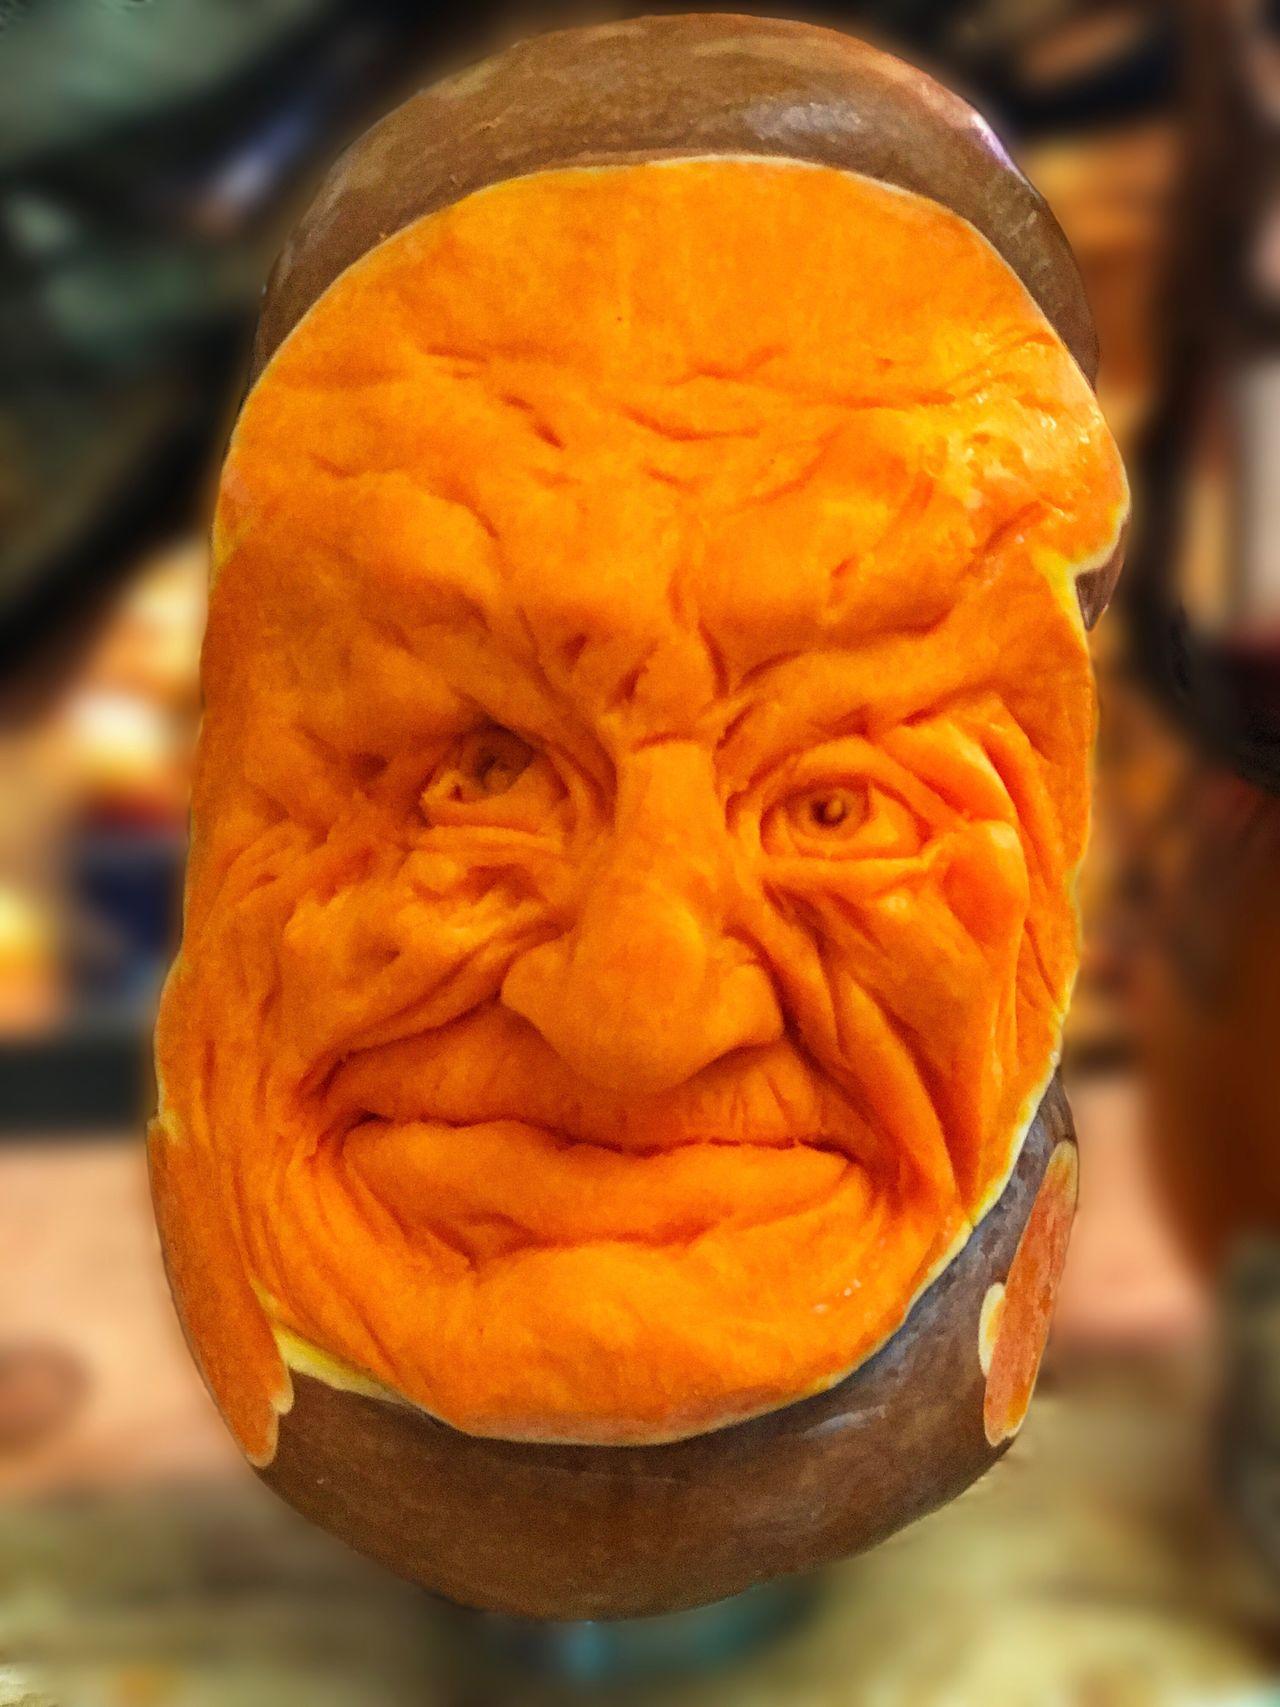 Kopf Close-up Orange Color IPhone 7 Plus Headshot Face Gesicht Schnitzerei Halloween Kürbis Potsdam Pumpkin Focus On Foreground Horror